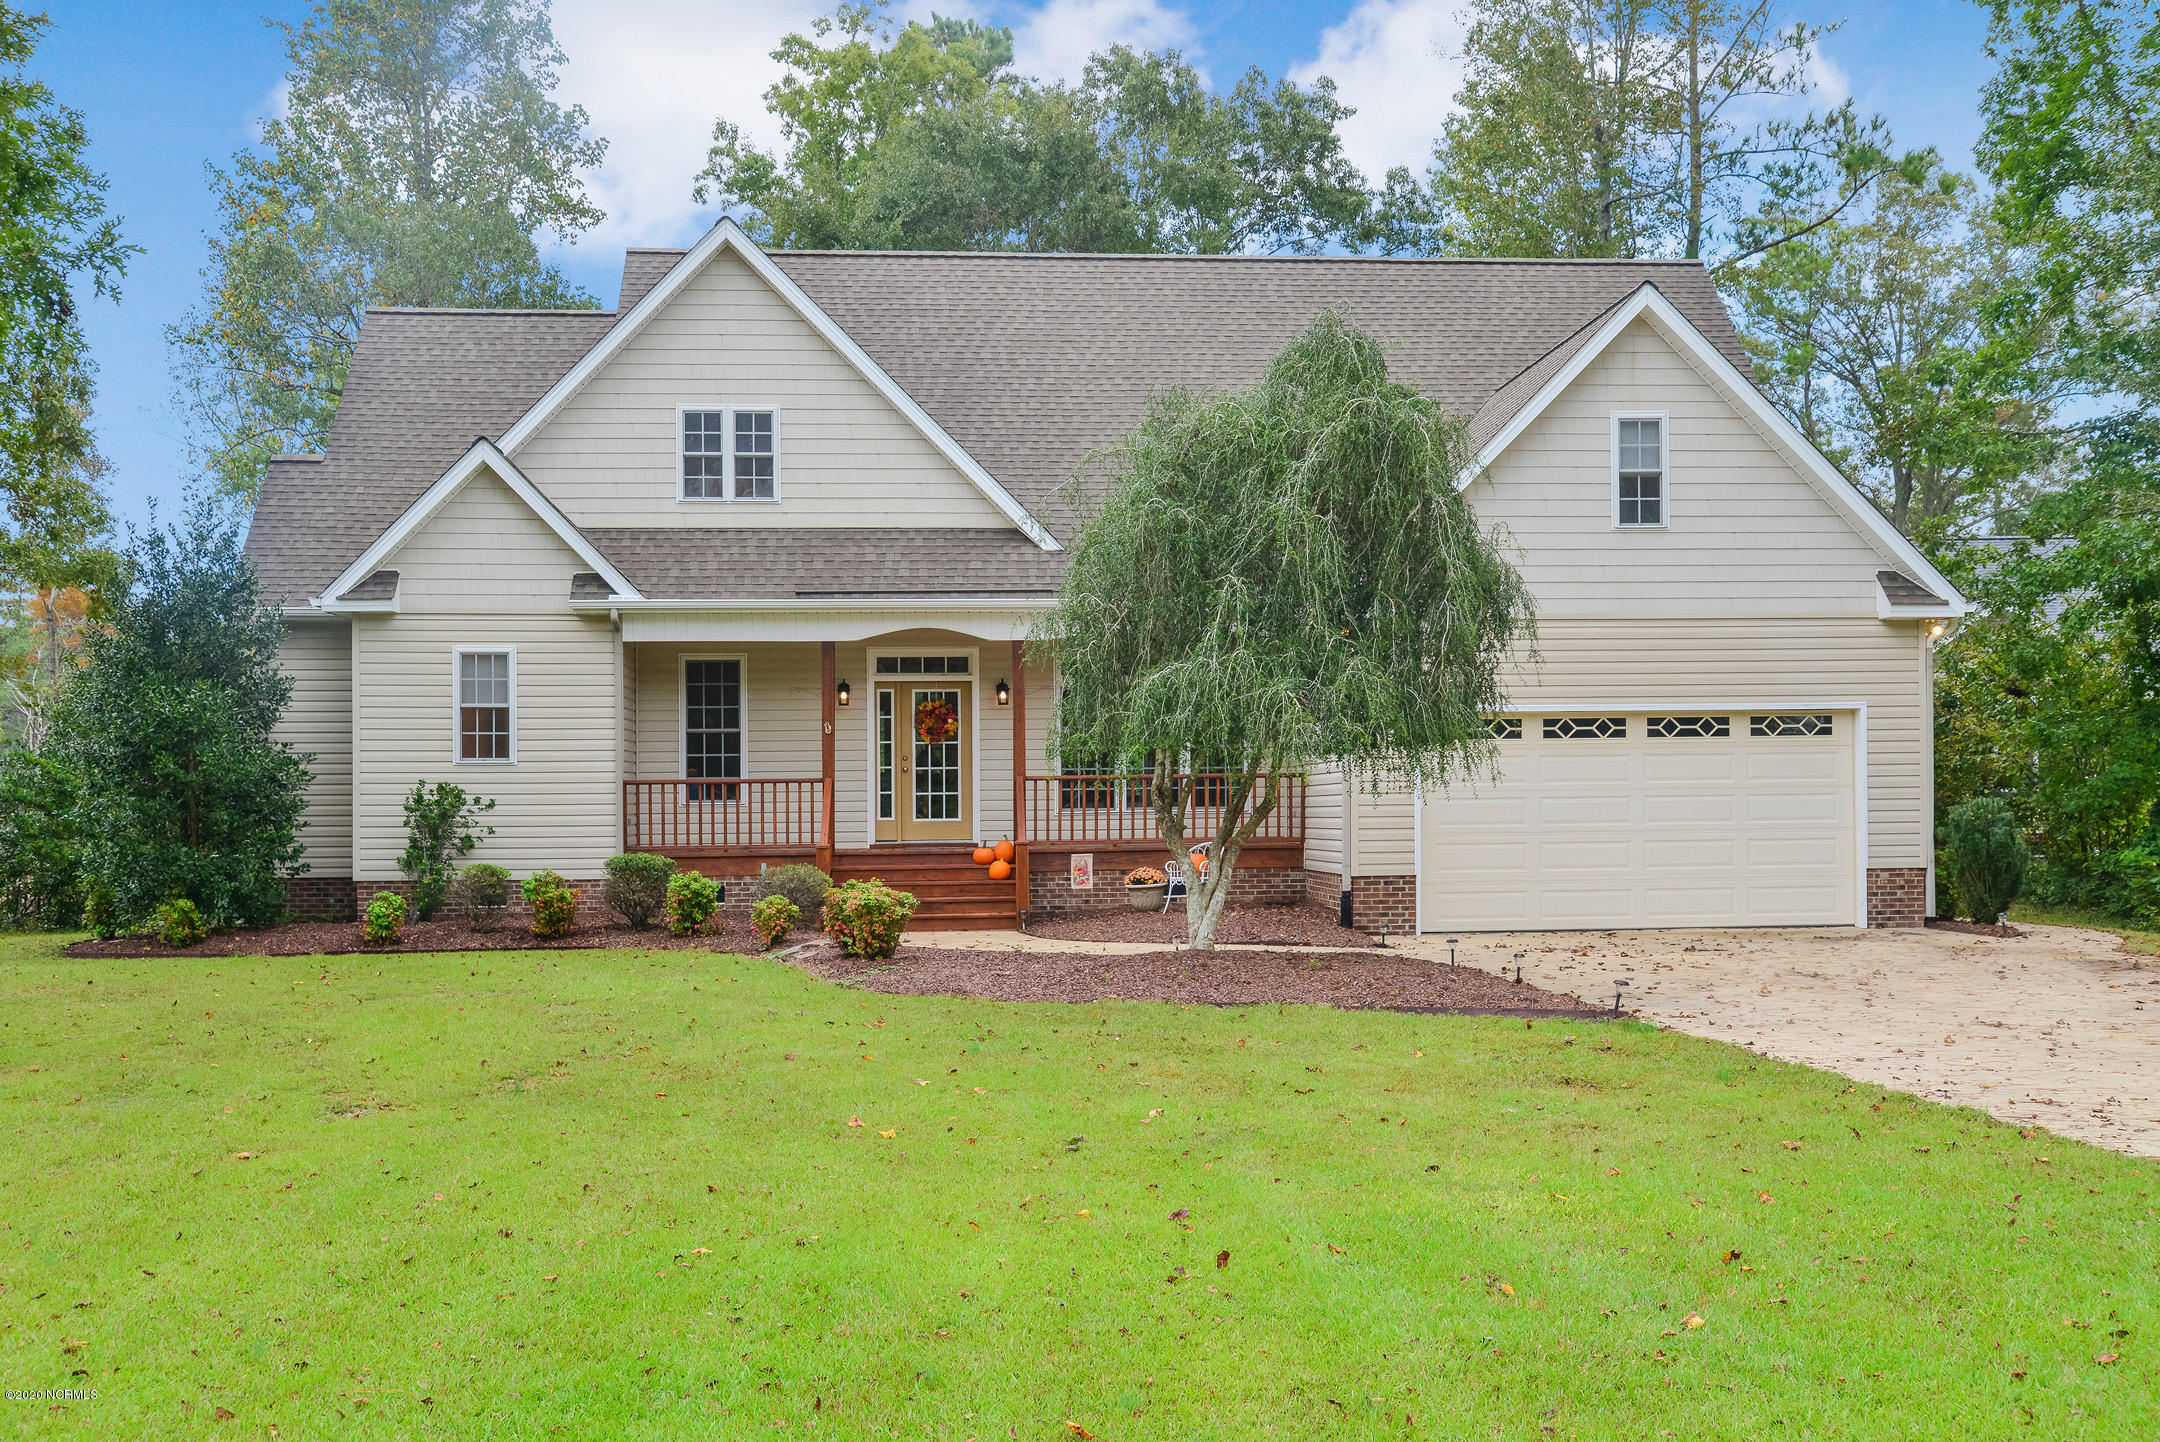 803 Treasure Point Drive, Bath, North Carolina 27808, 3 Bedrooms Bedrooms, 8 Rooms Rooms,3 BathroomsBathrooms,Single family residence,For sale,Treasure Point,100241271